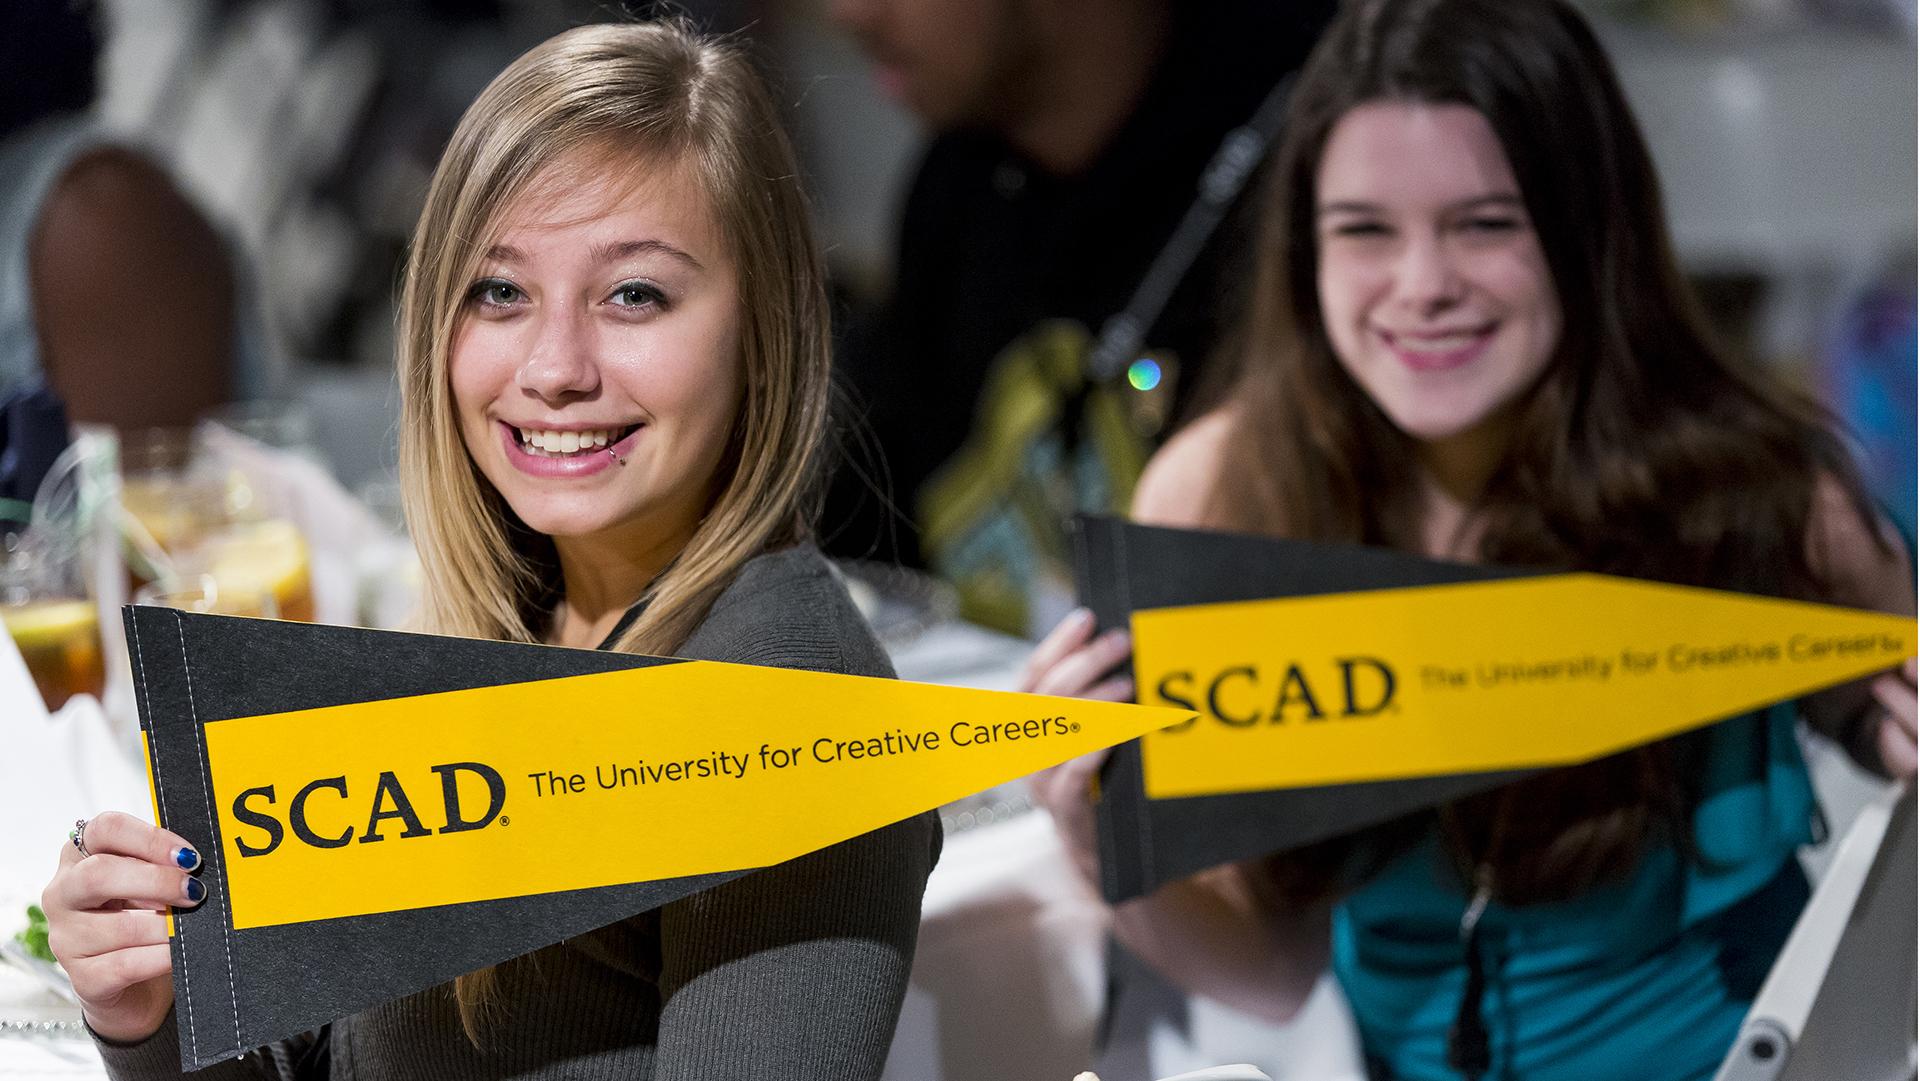 SCAD pre-college programs - YouTube